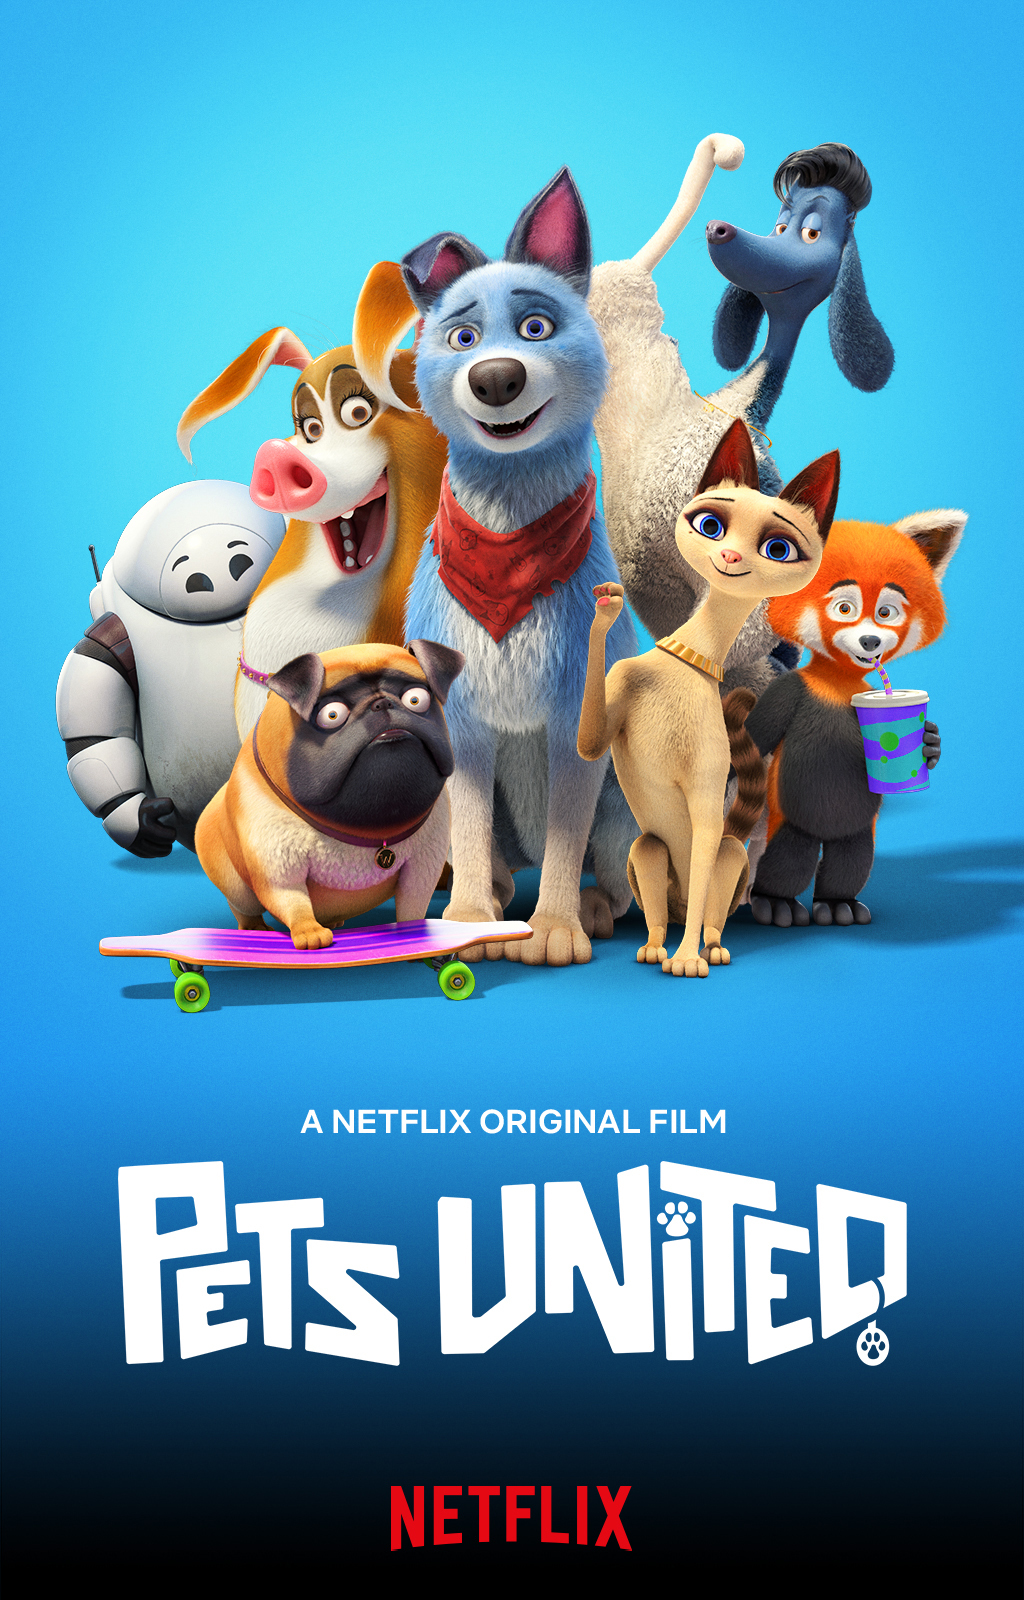 Pets Netflix